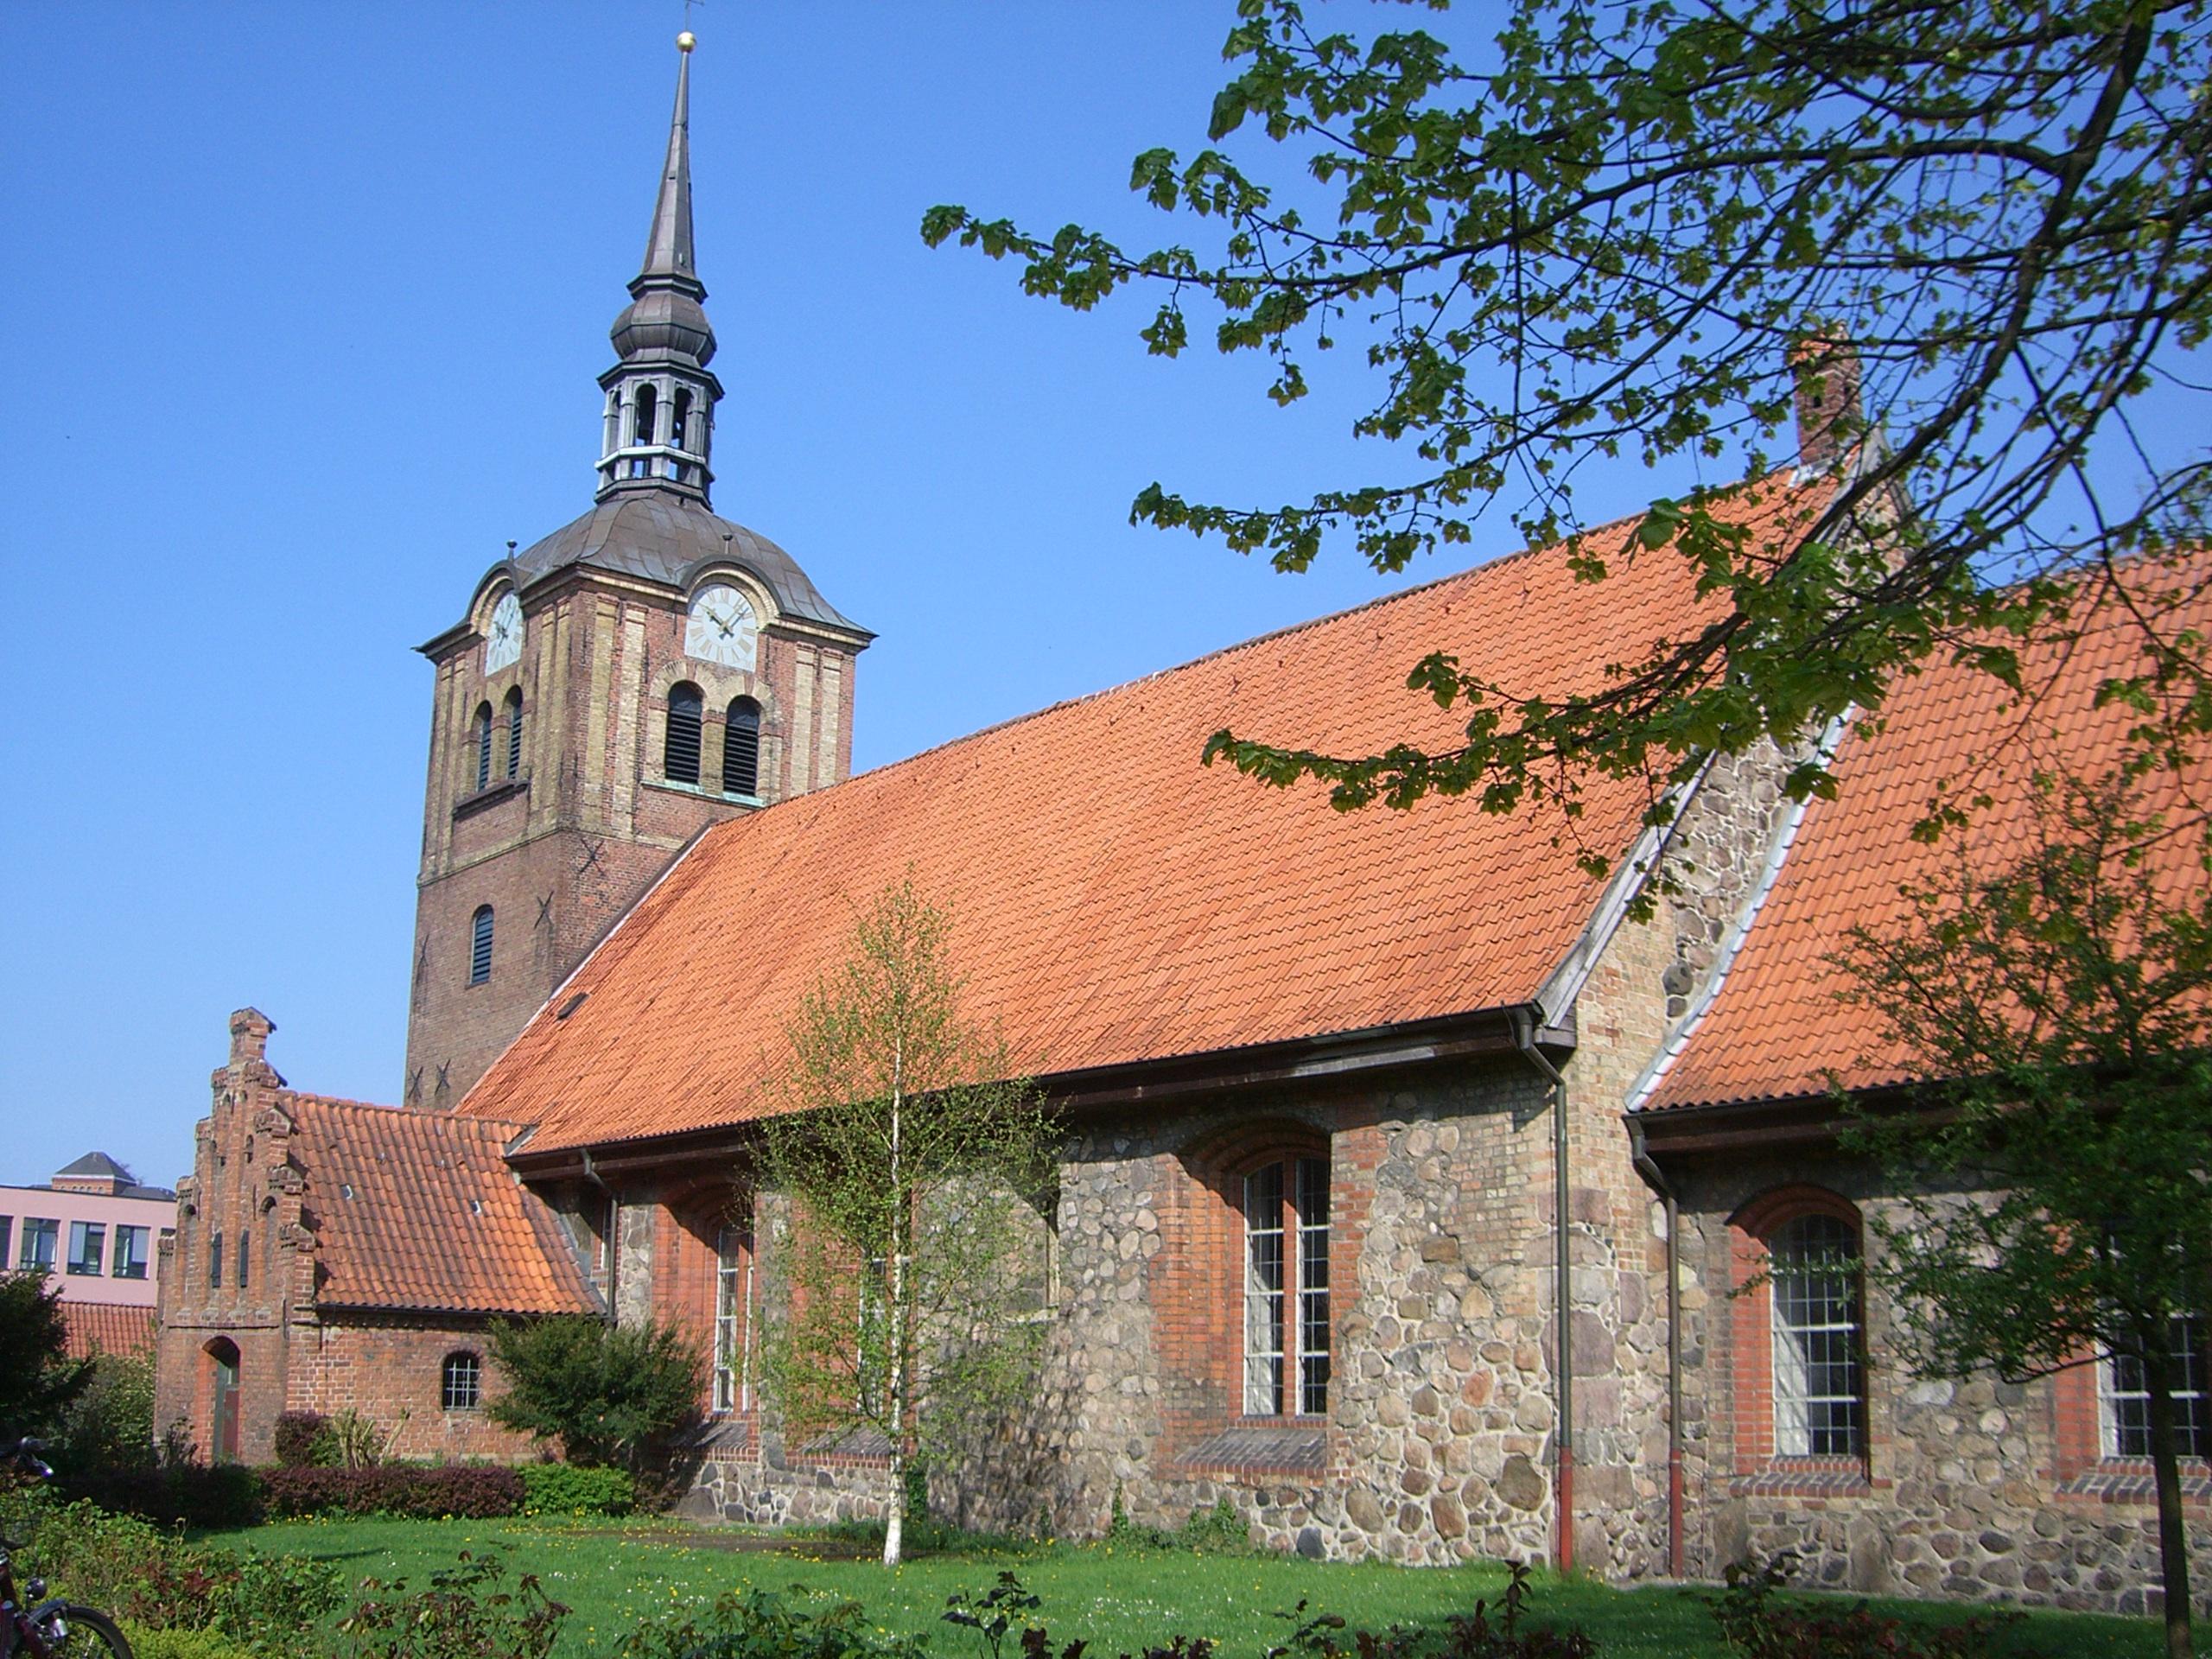 St Johannis Flensburg